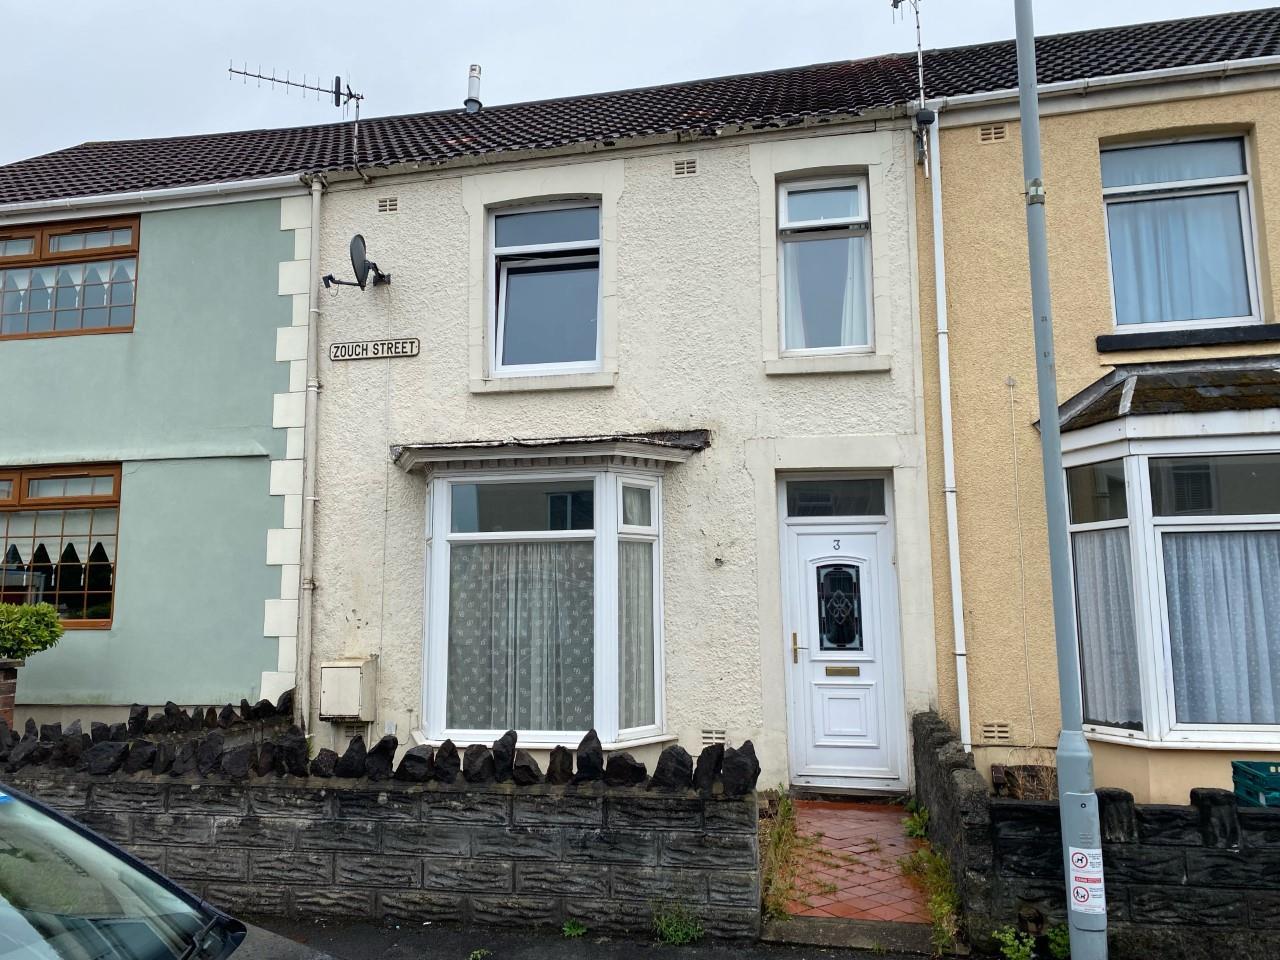 Zouch Street, Manselton, Swansea, SA5 9PJ